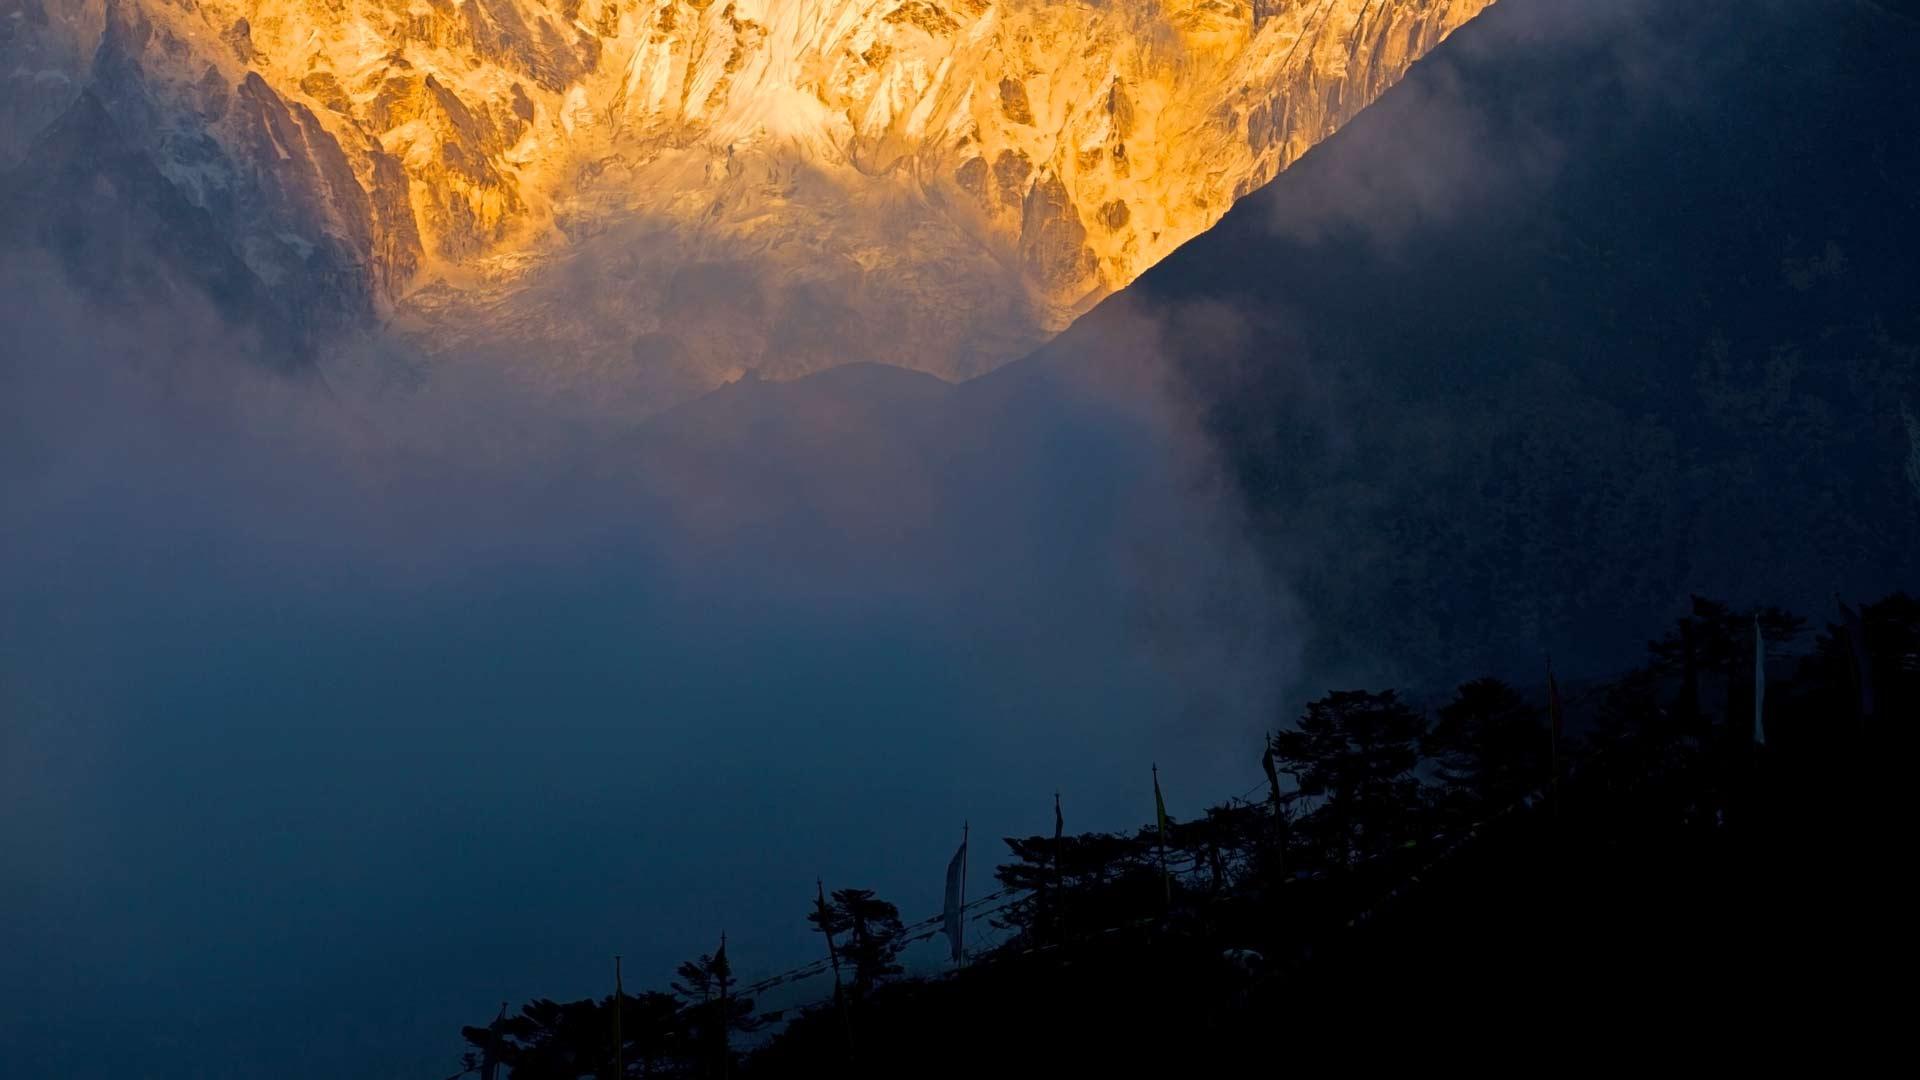 Klosterblick Tengboche im Everest-Gebiet, Himalaya